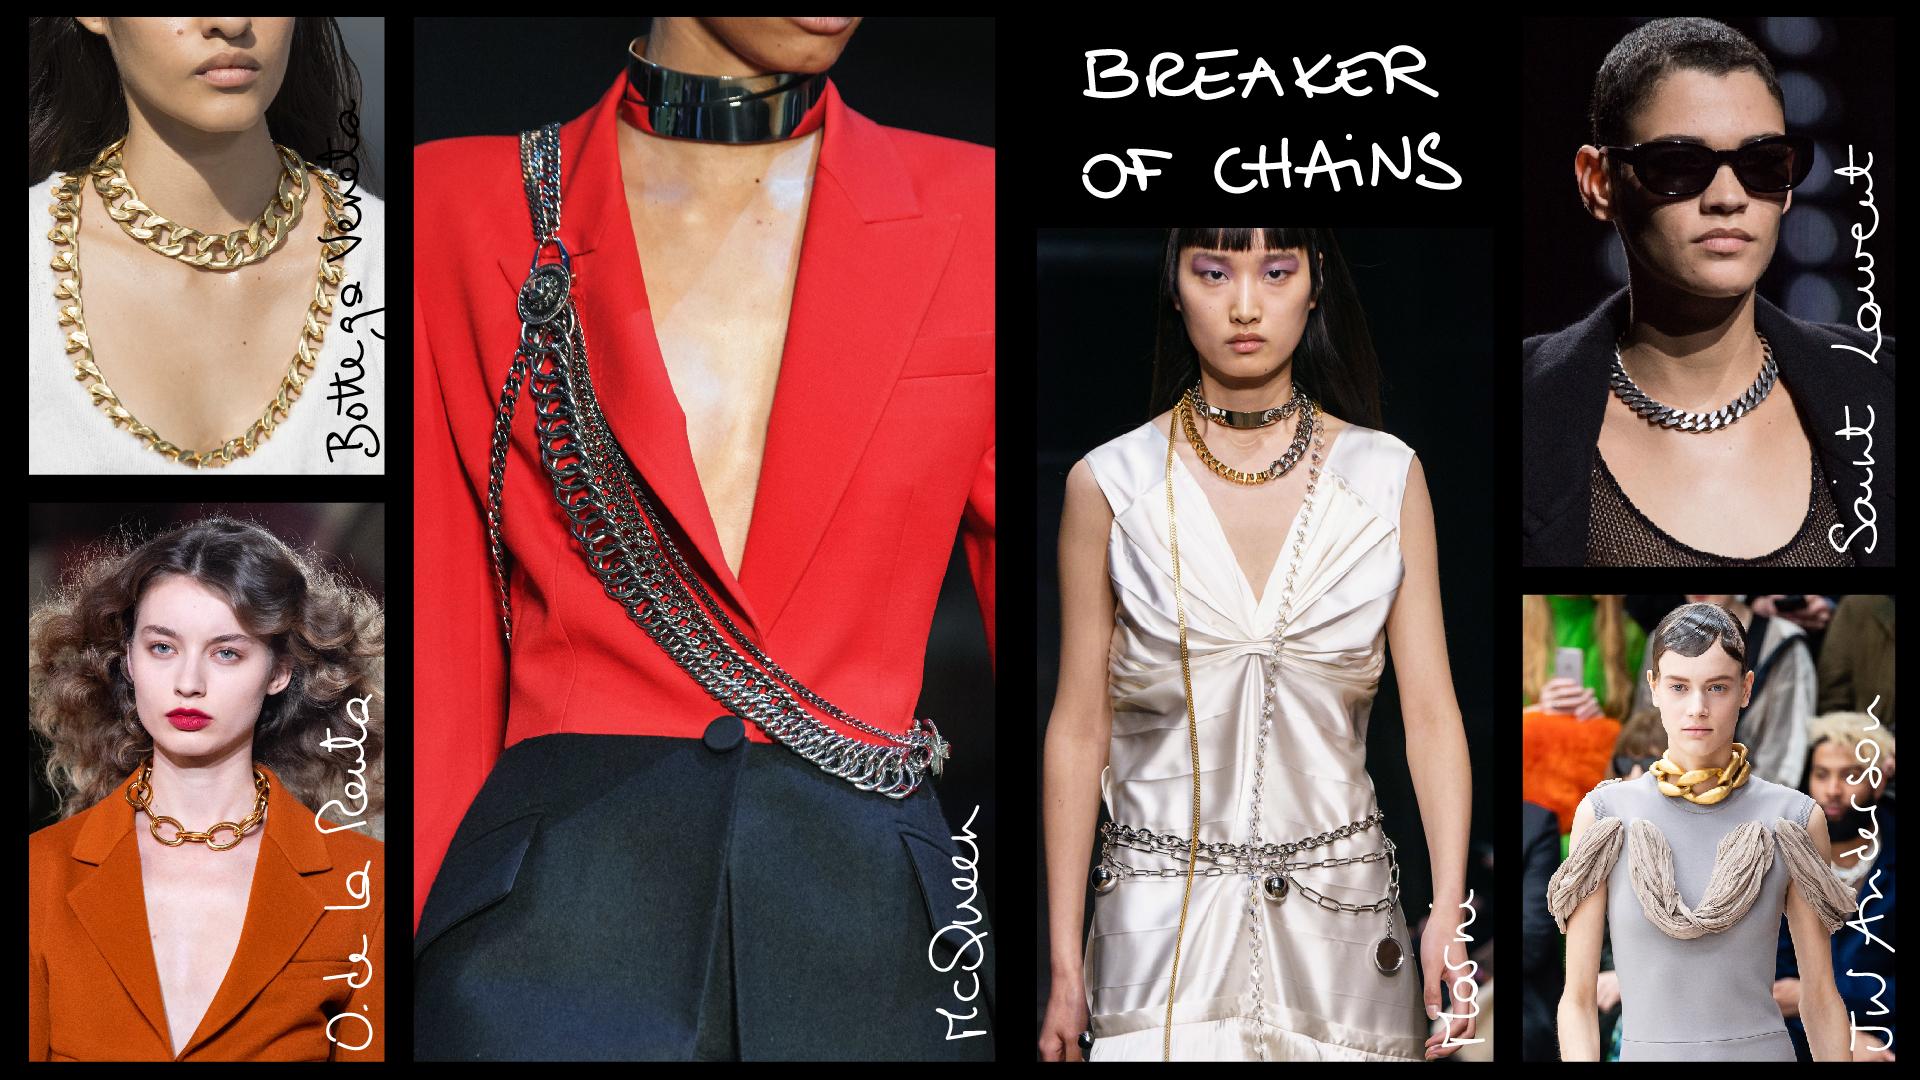 Justine-Leconte_fashion-trends-fall-winter-2019_boards-07.jpg